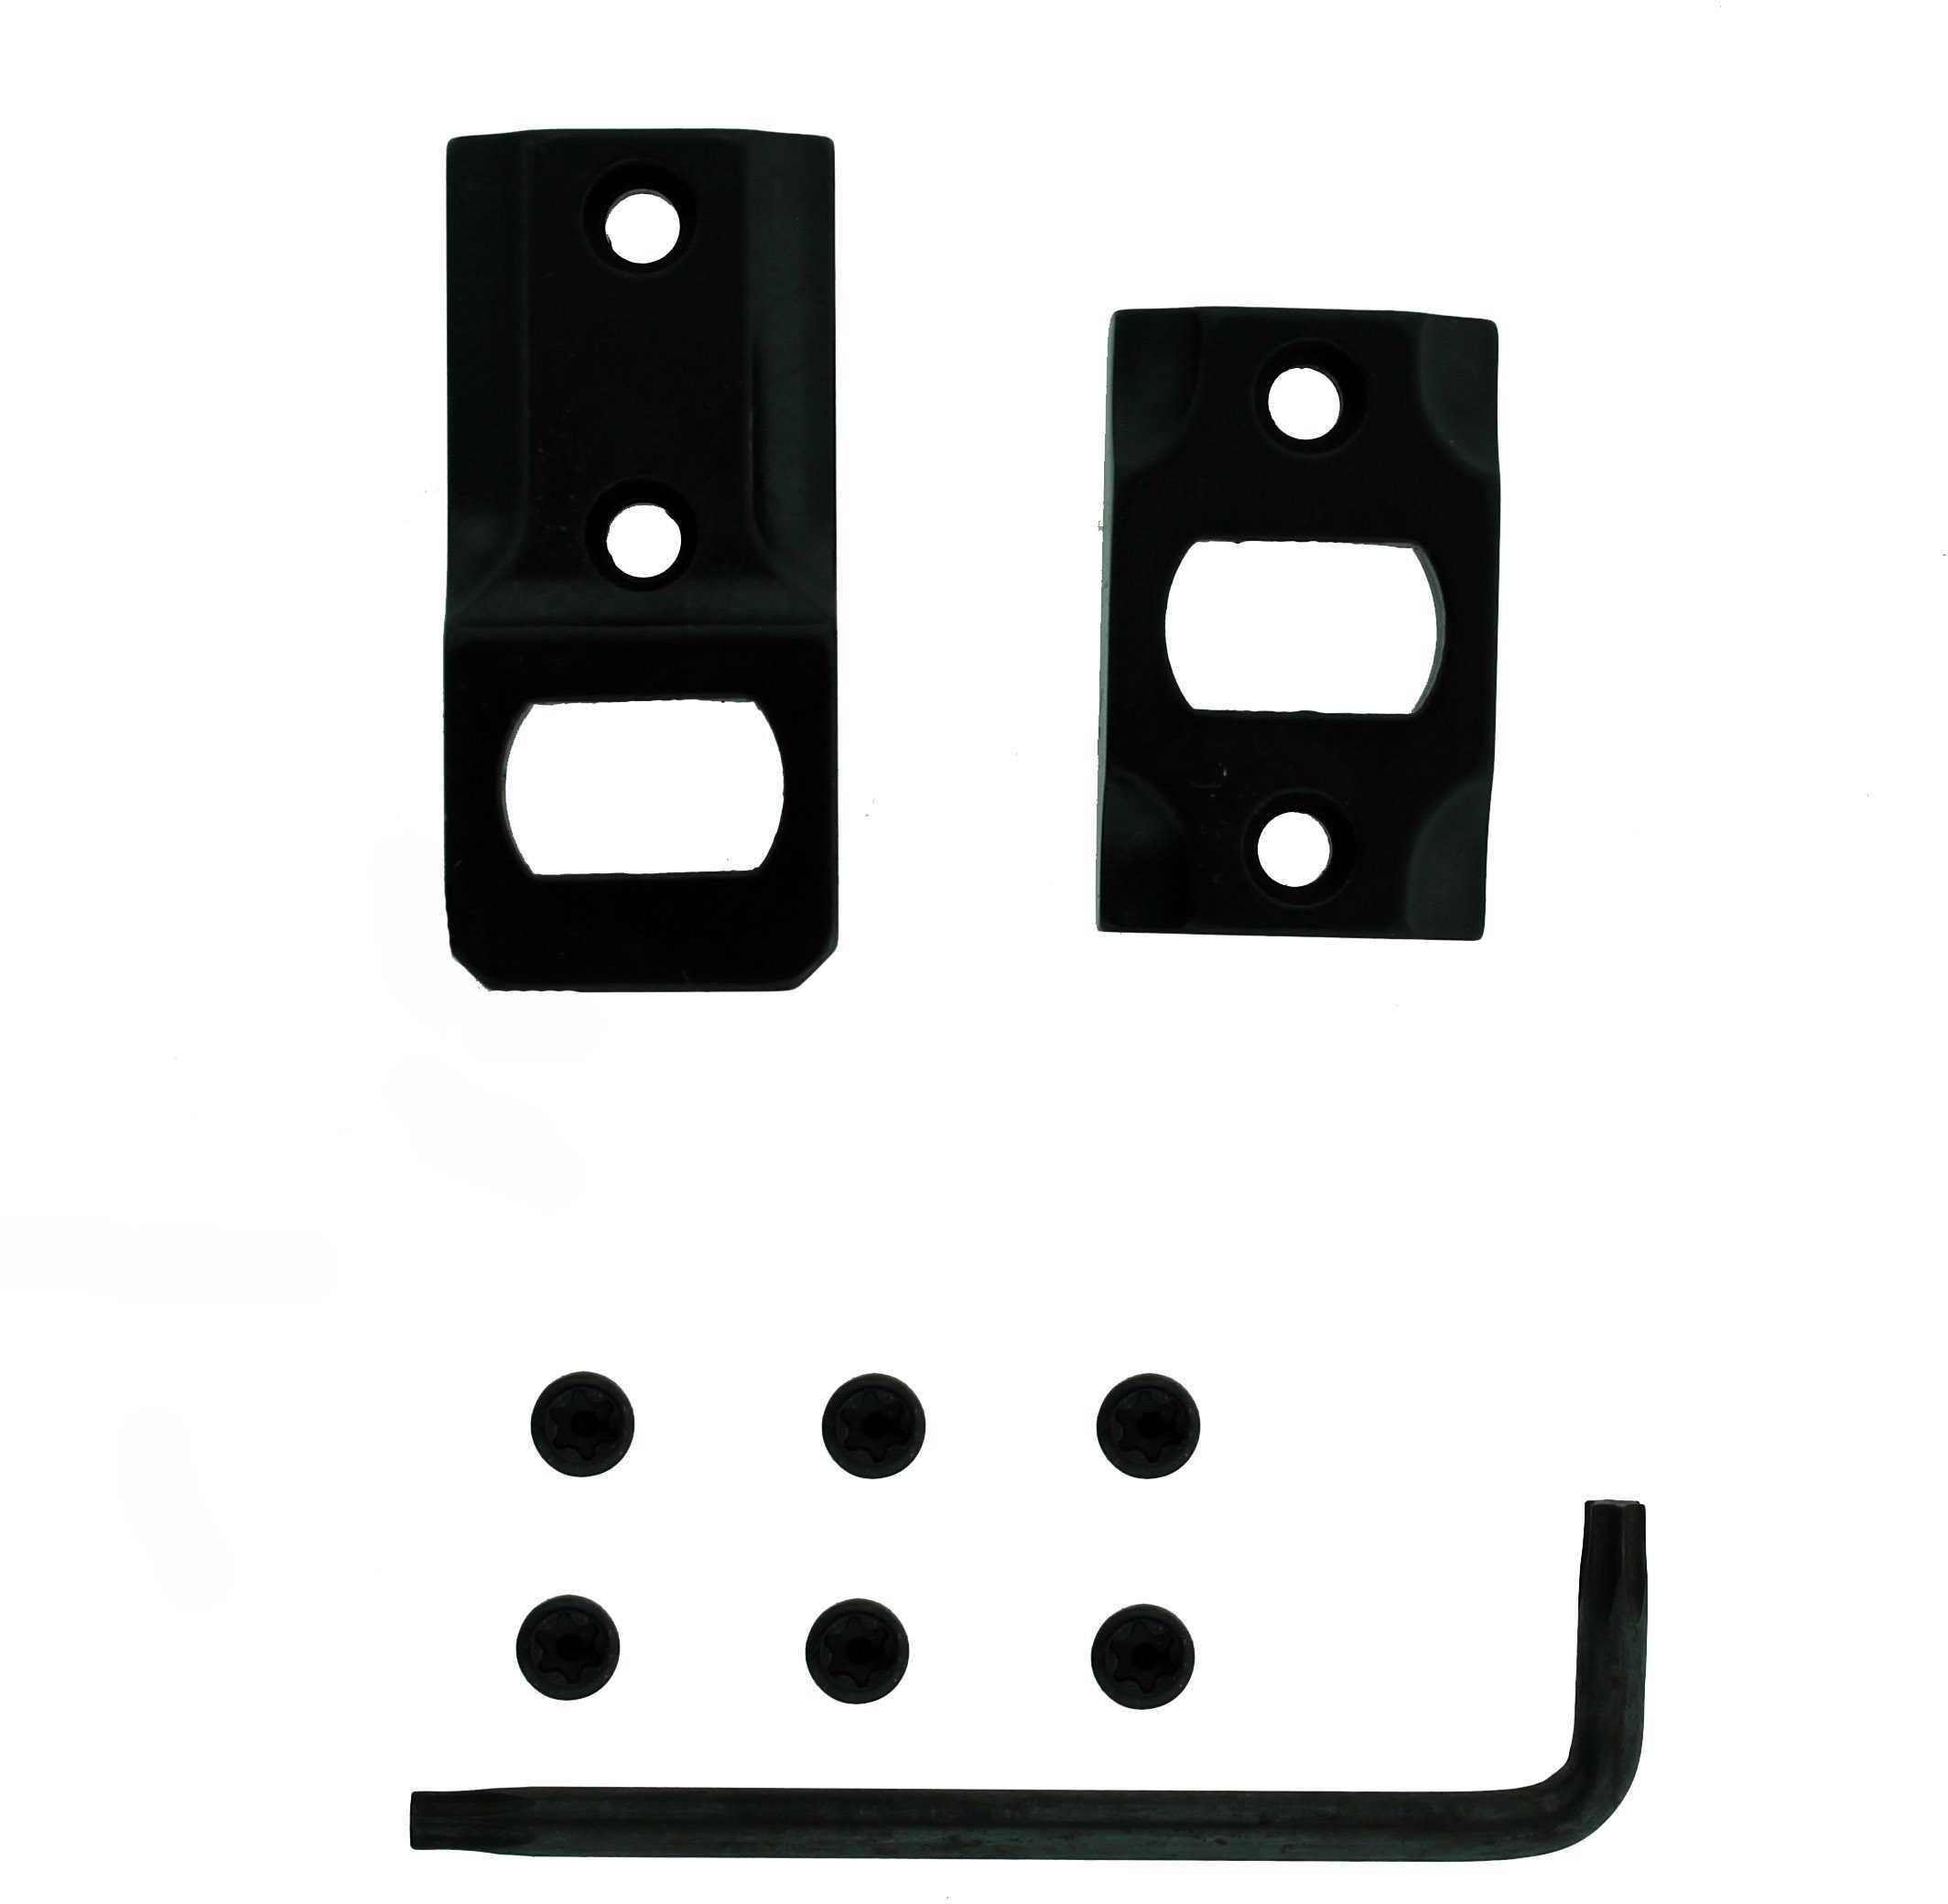 Leupold Dual Dovetail Two Piece Base Mark V Black Md: 51705